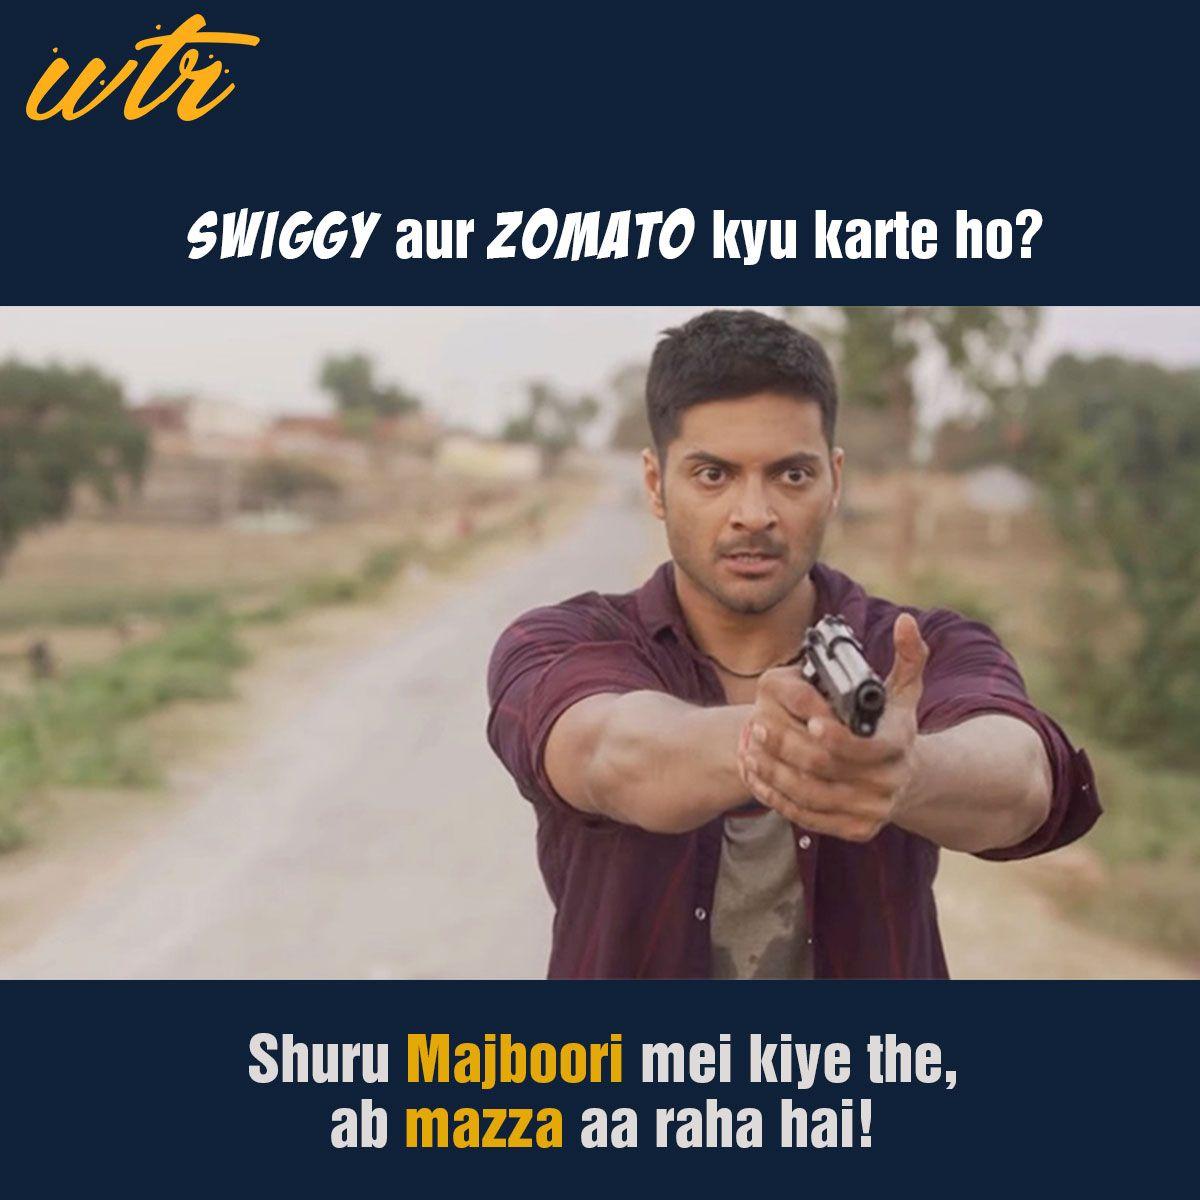 Swiggy Zomato Wala Mirzapur Memes Sarcastic Stupid Funny Memes Food Memes